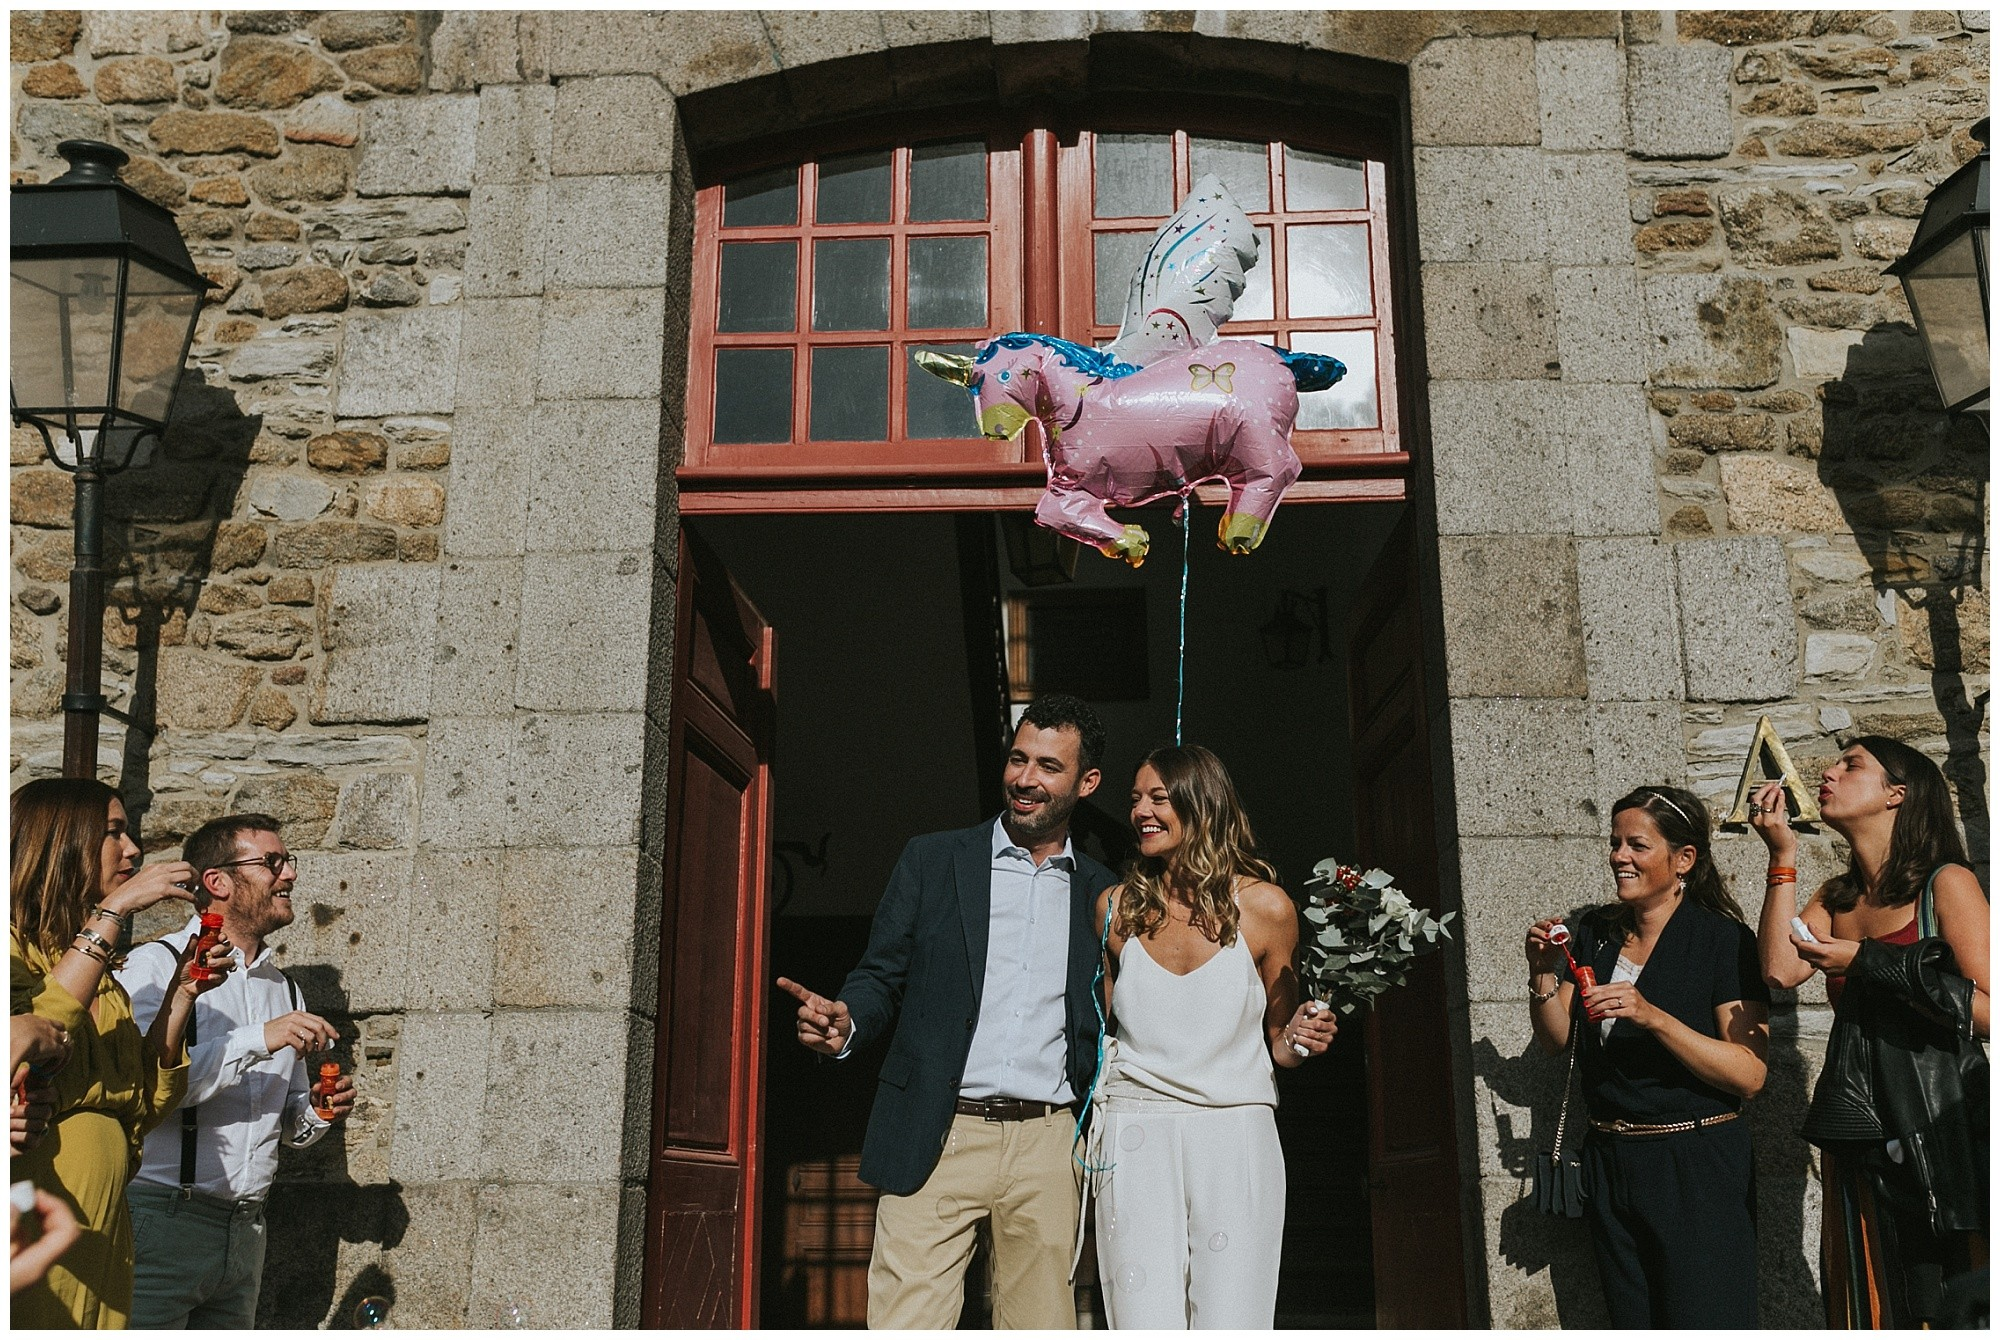 Kateryna-photos-photographe-mariage-bretagne-saint-malo-finistere-cotes-darmor-wedding_0056.jpg